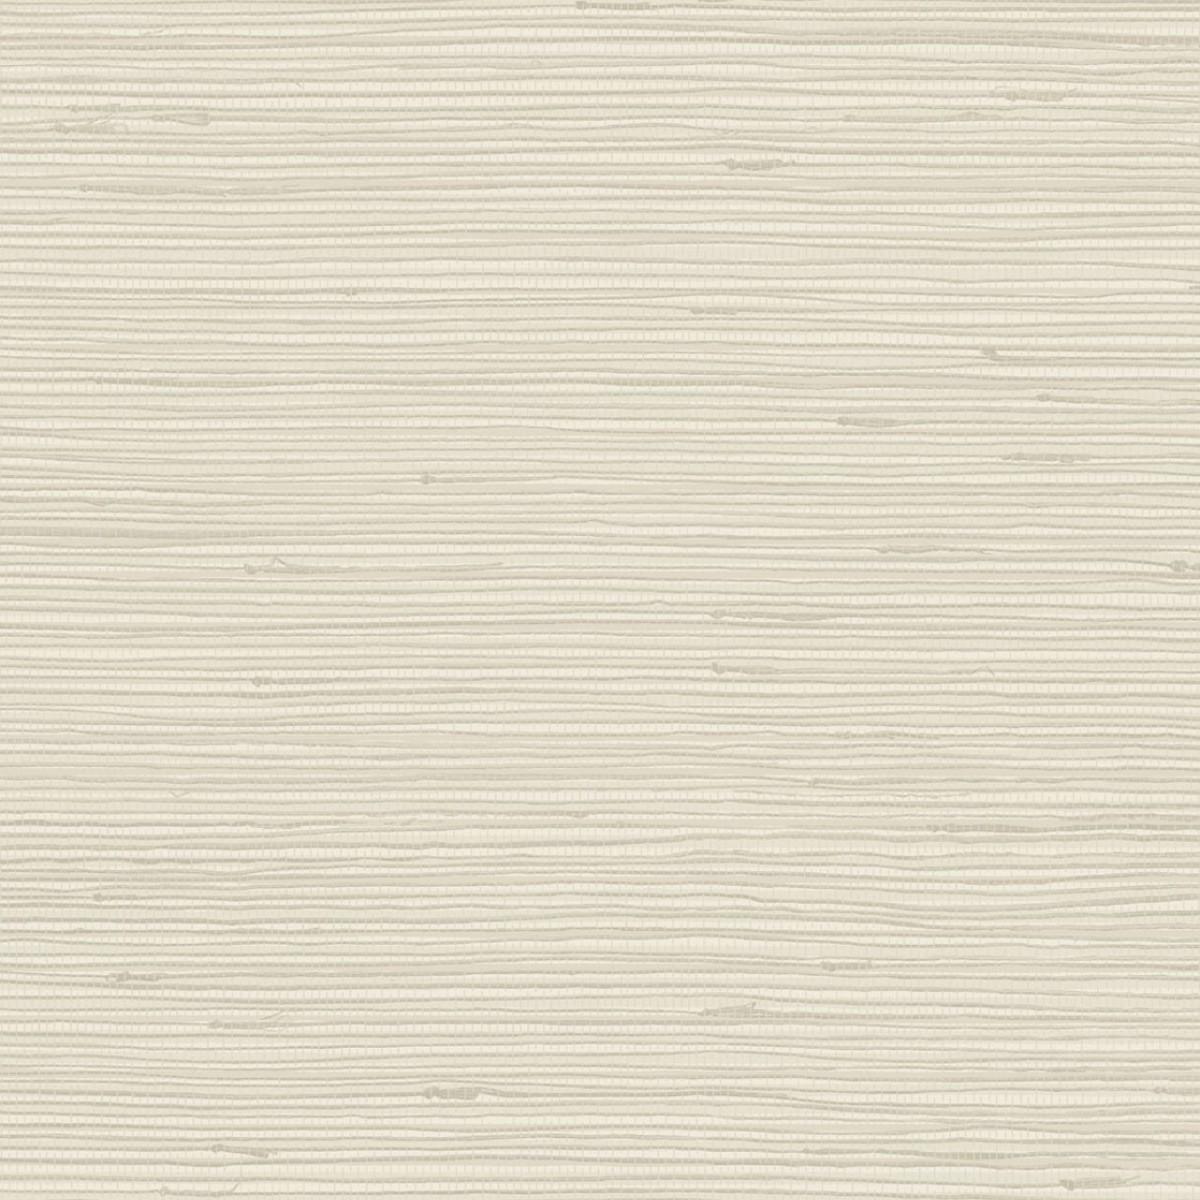 Tapet lavabil Blend 363031, 5.2mp / rolă, Eijffinger